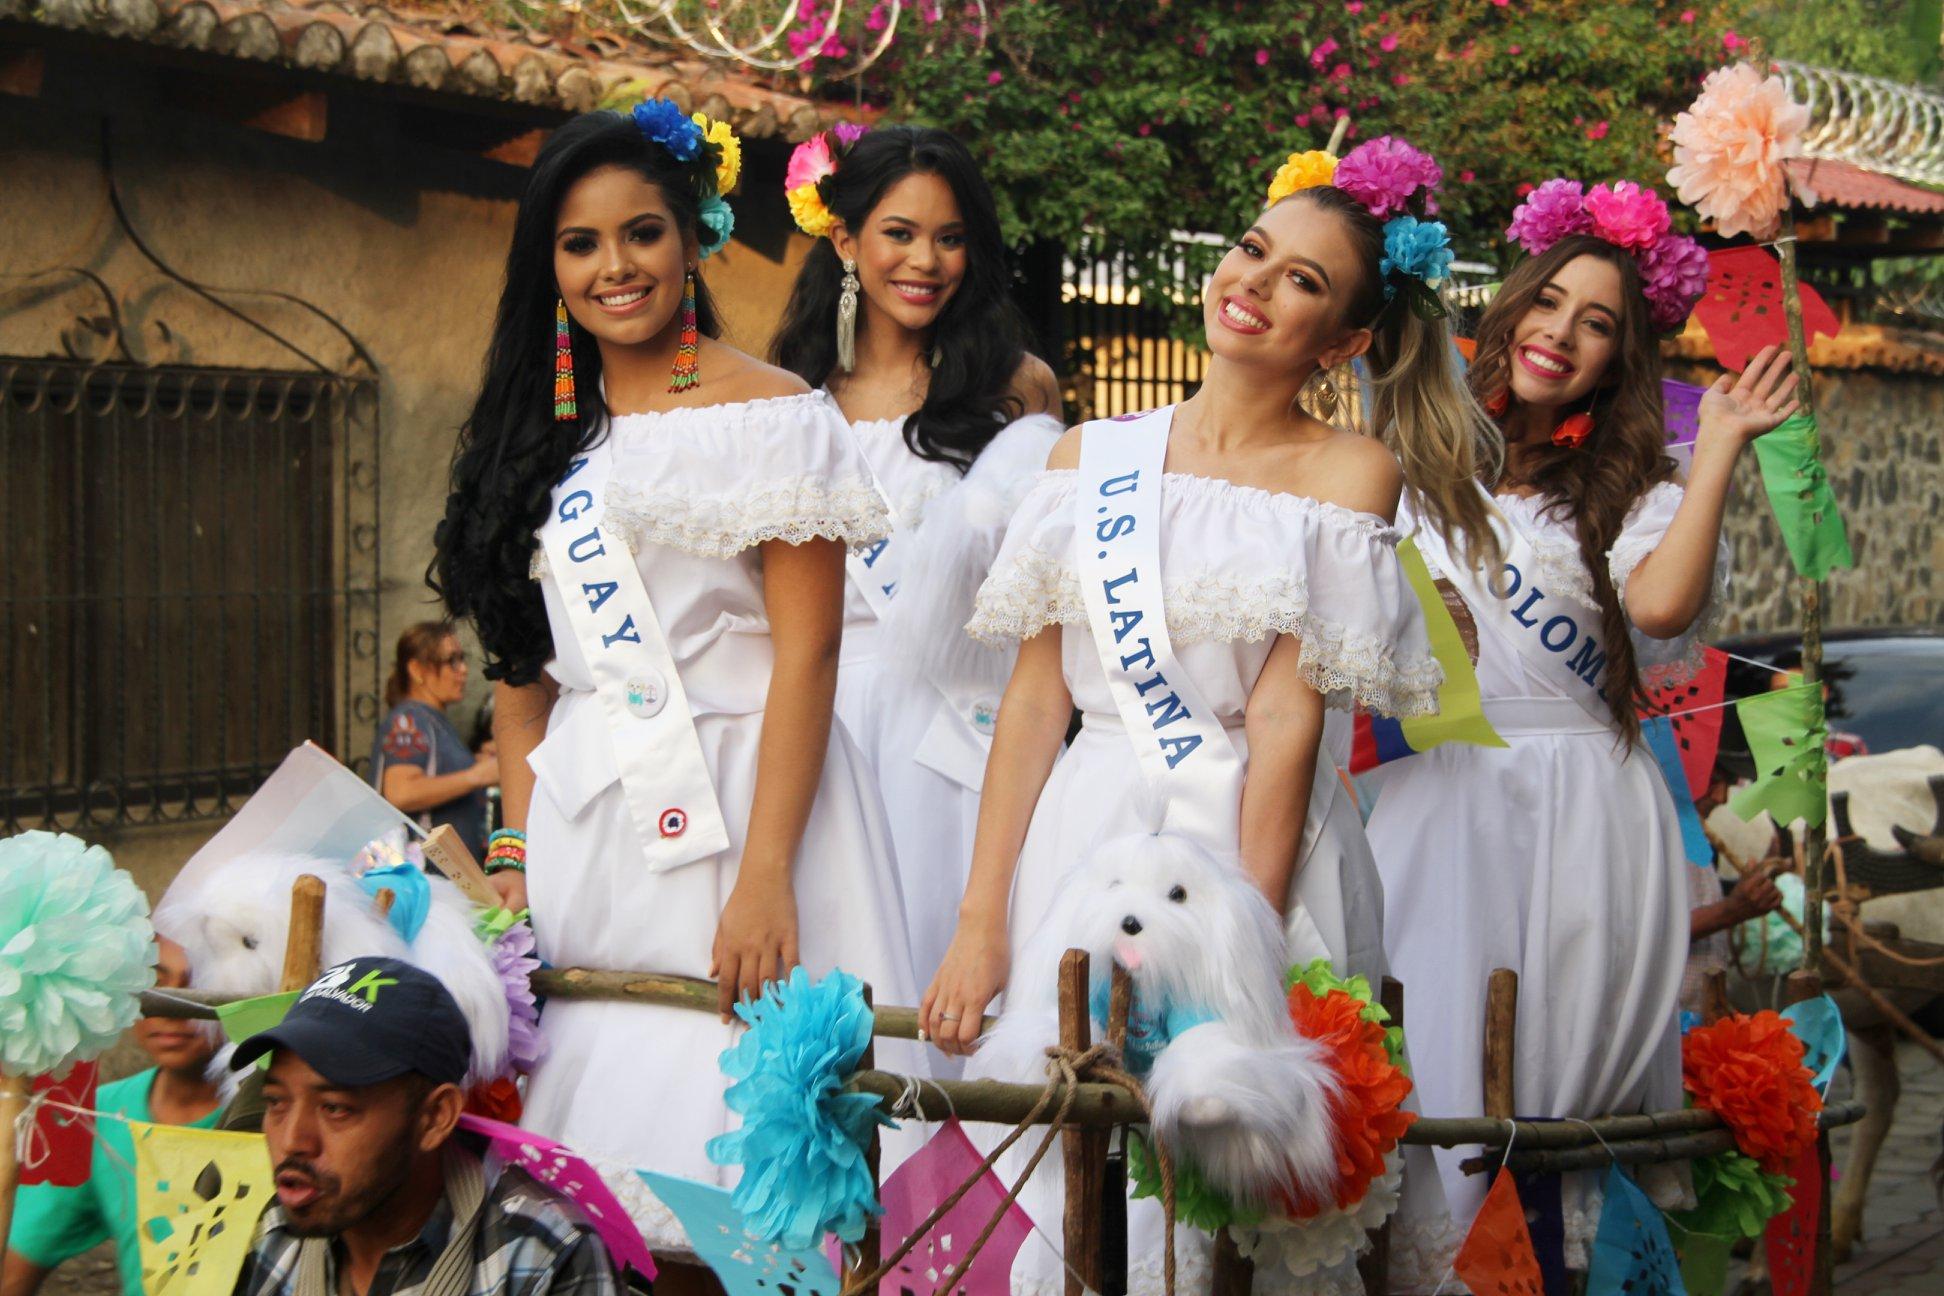 estefany frost, miss teen mundial latina usa 2019. - Página 5 60402410